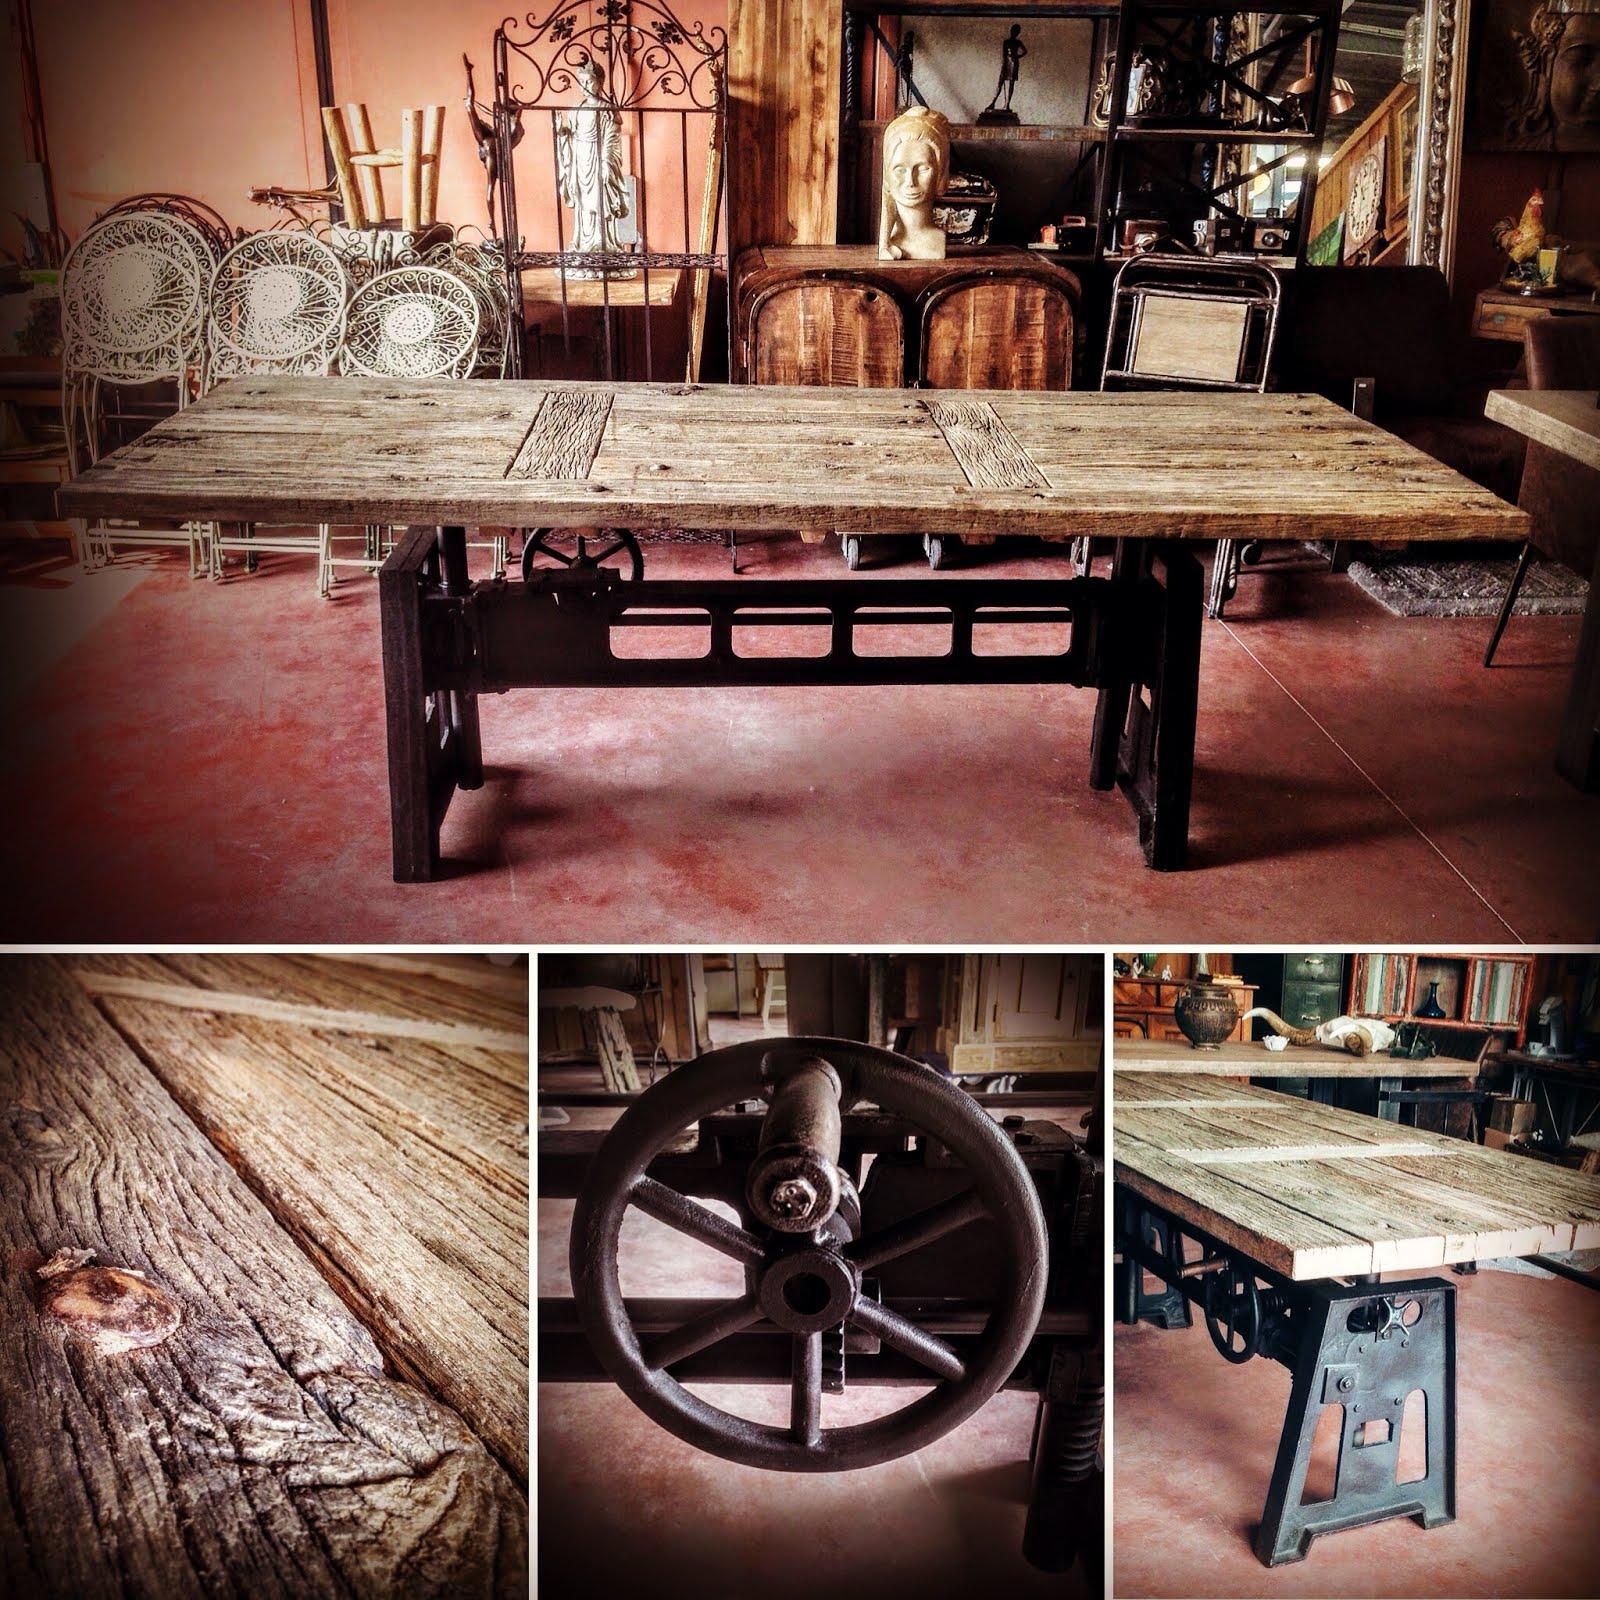 vitadeco table bois m tal design industriel table l vatrice design industrielle bois 150 ans. Black Bedroom Furniture Sets. Home Design Ideas